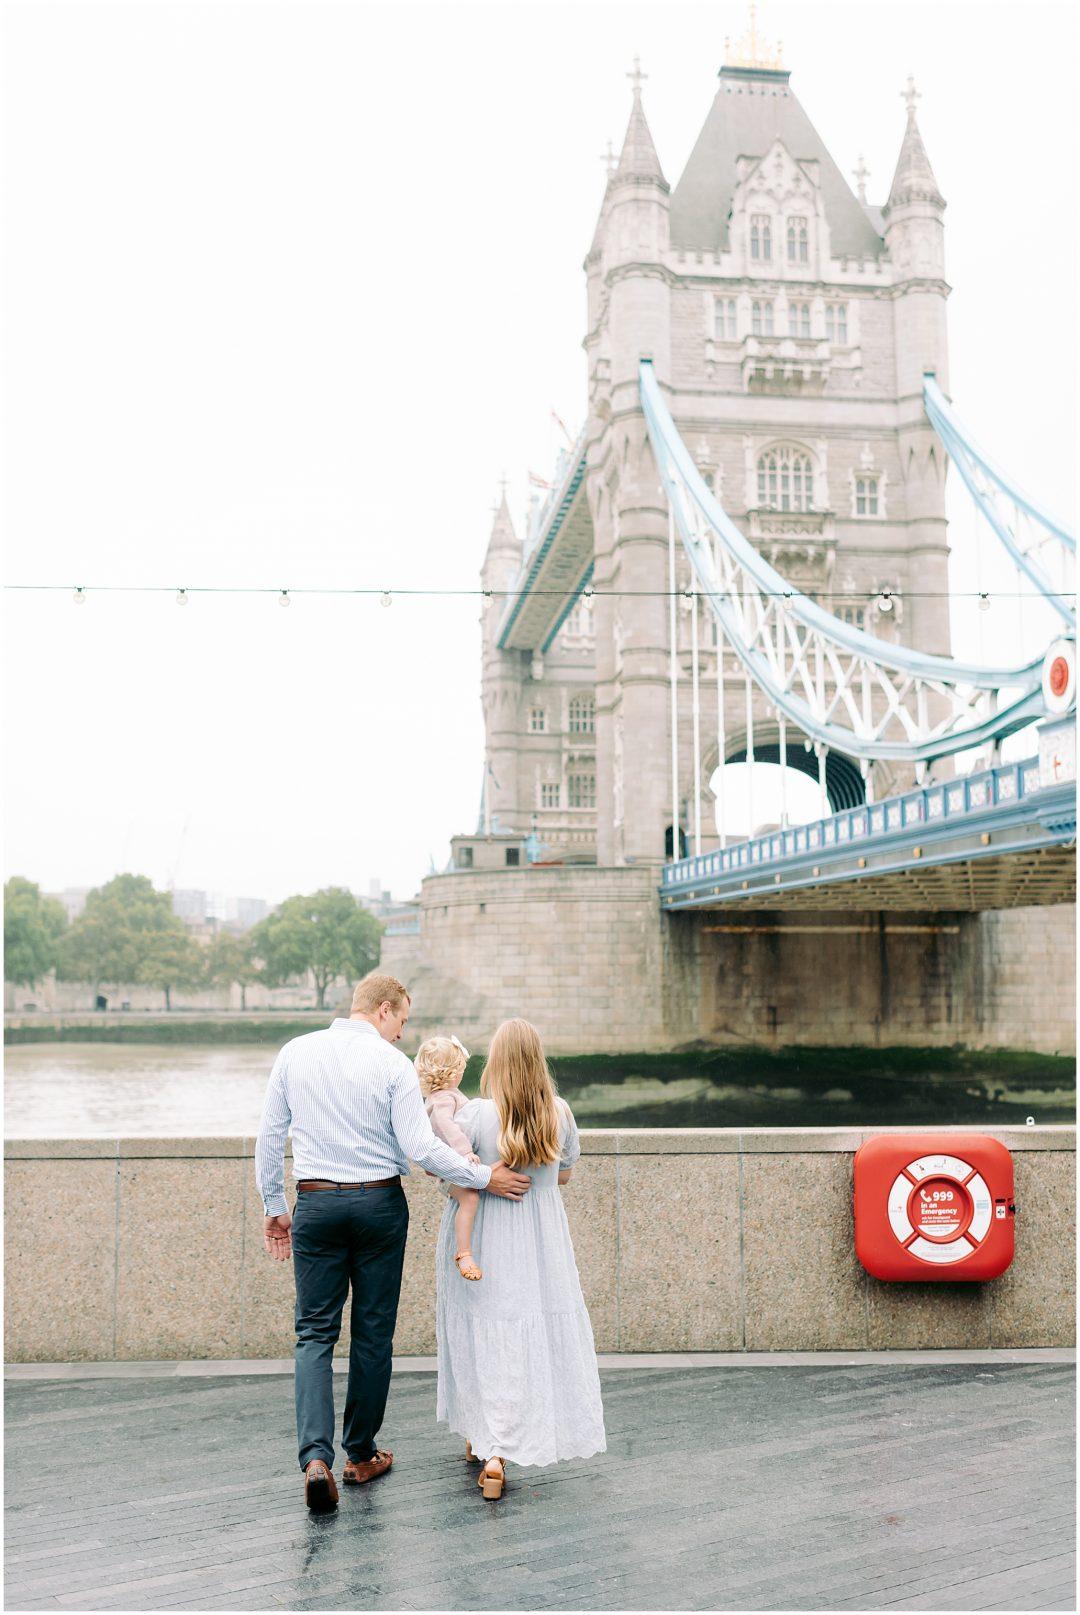 London family photographer, Tower Bridge family shoot, Nkimaphotography_0022.jpg